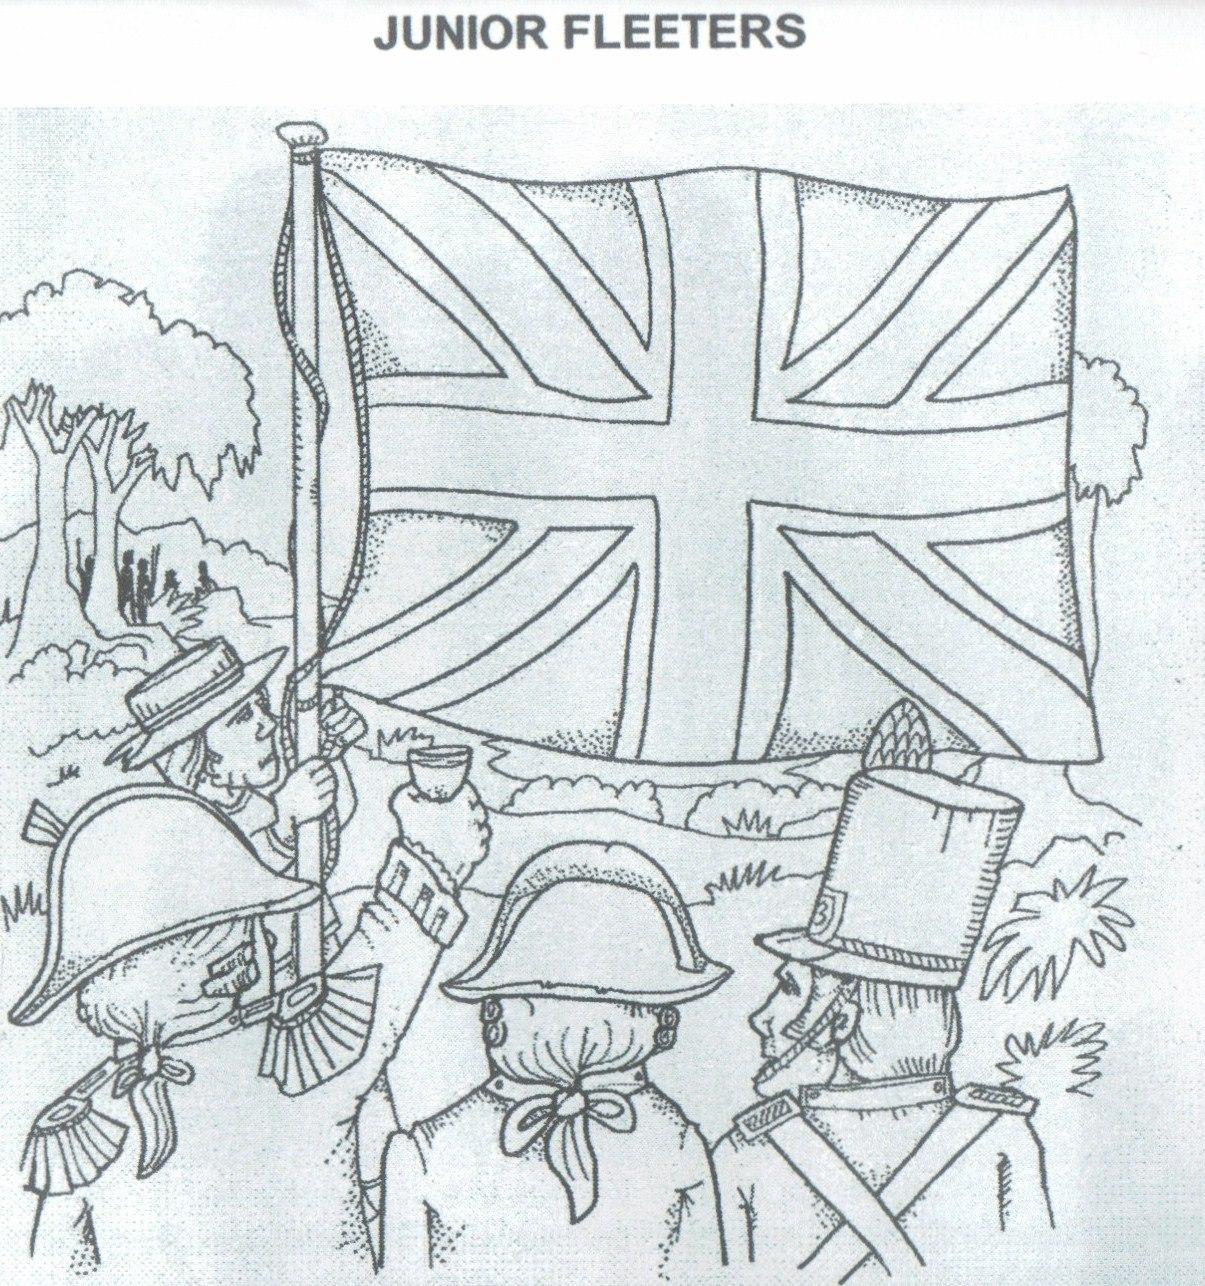 26january 1788 a flagstaff was erected at sydney cove captain arthur ...